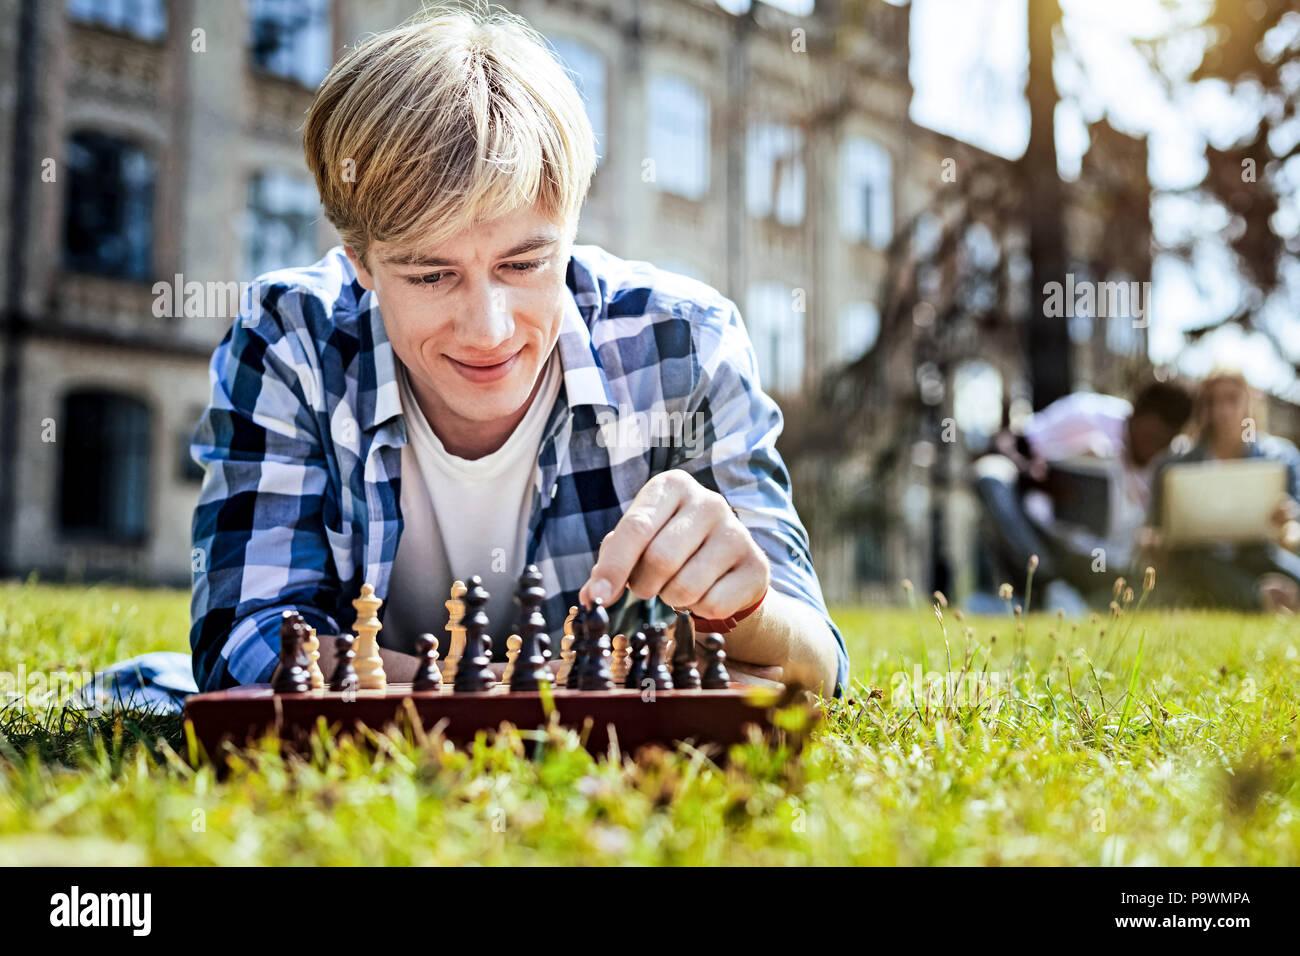 Hübscher junger Mann spielt Schach im Freien Stockbild